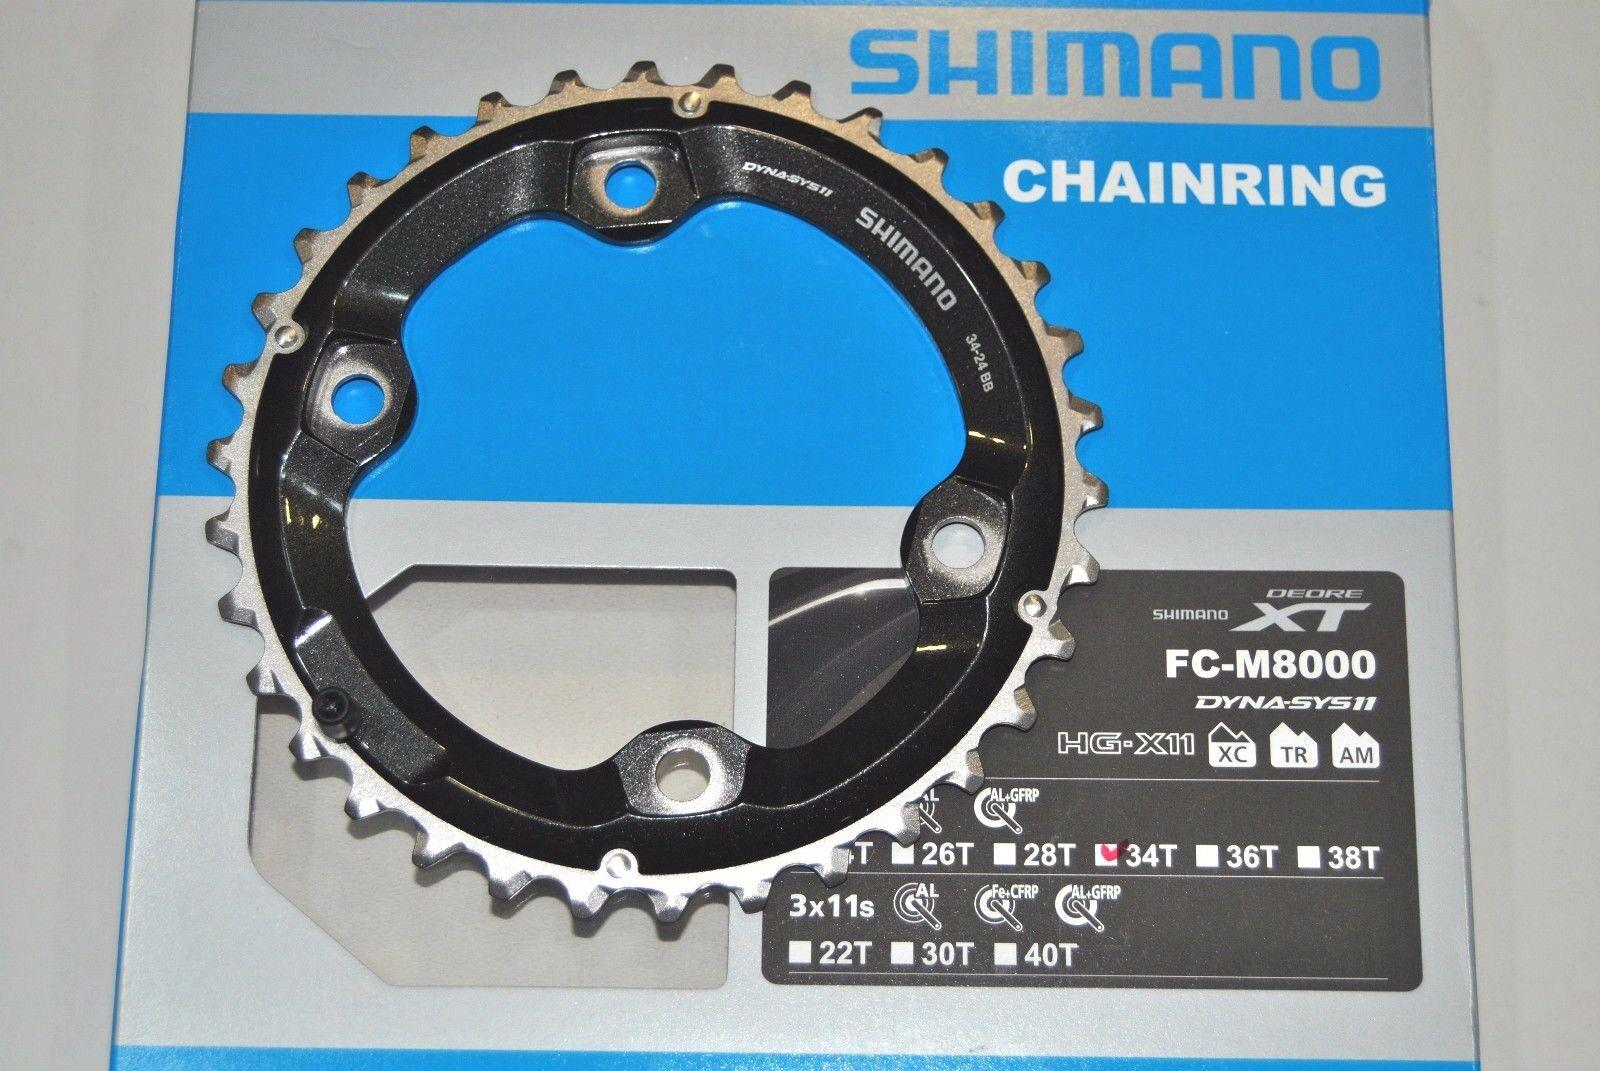 Corona SHIMANO XT 34T BB FC-M8000 ( 34x24 ) CHAINRING  SHIMANO XT 34T BB FC-M8000  los clientes primero